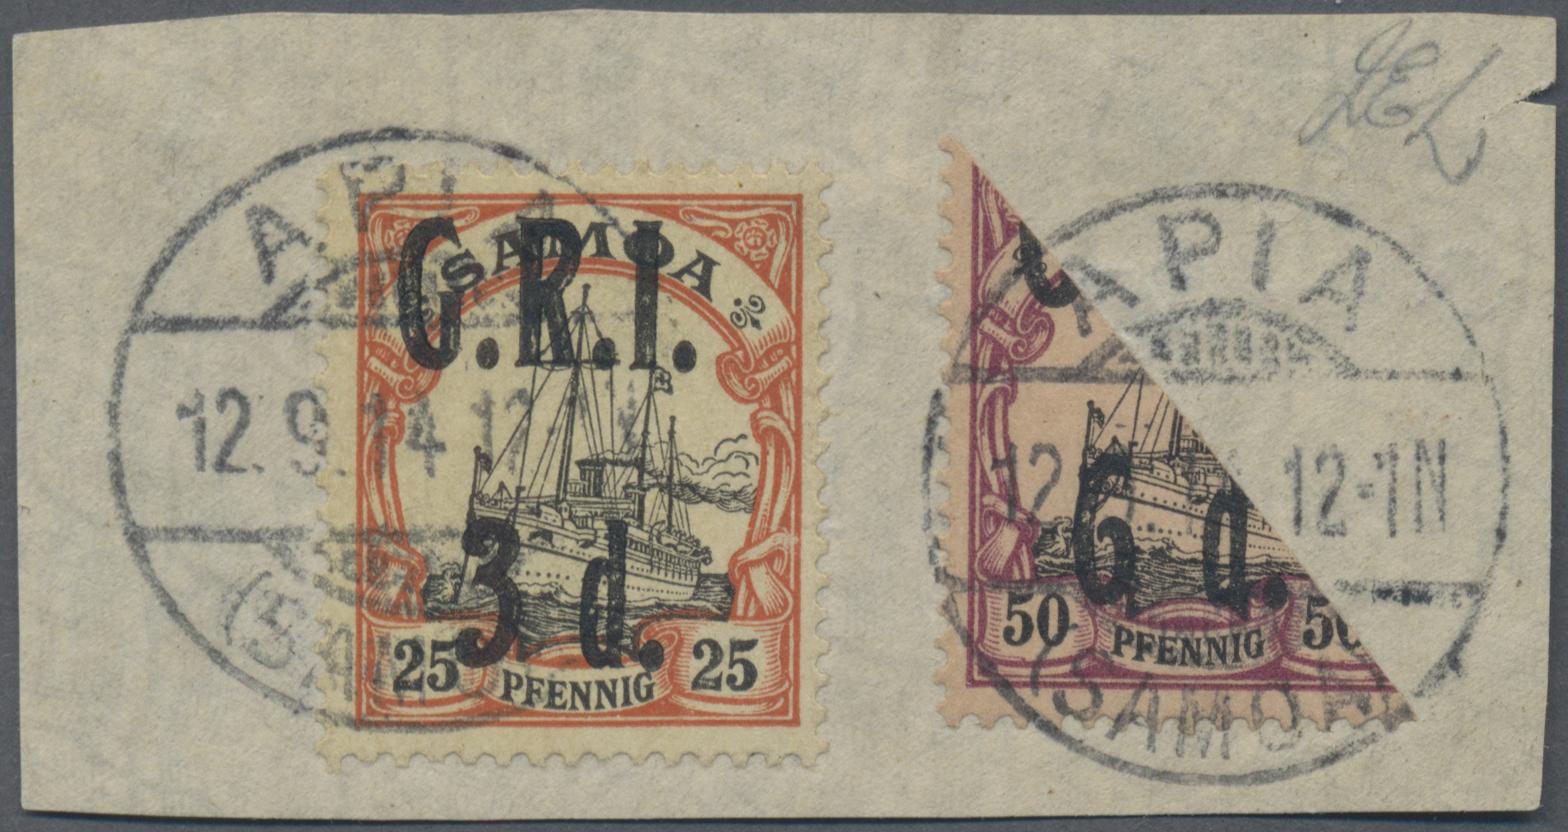 Lot 15783 - Deutsche Kolonien - Samoa - Britische Besetzung  -  Auktionshaus Christoph Gärtner GmbH & Co. KG Sale #46 Single lots Germany - and picture post cards